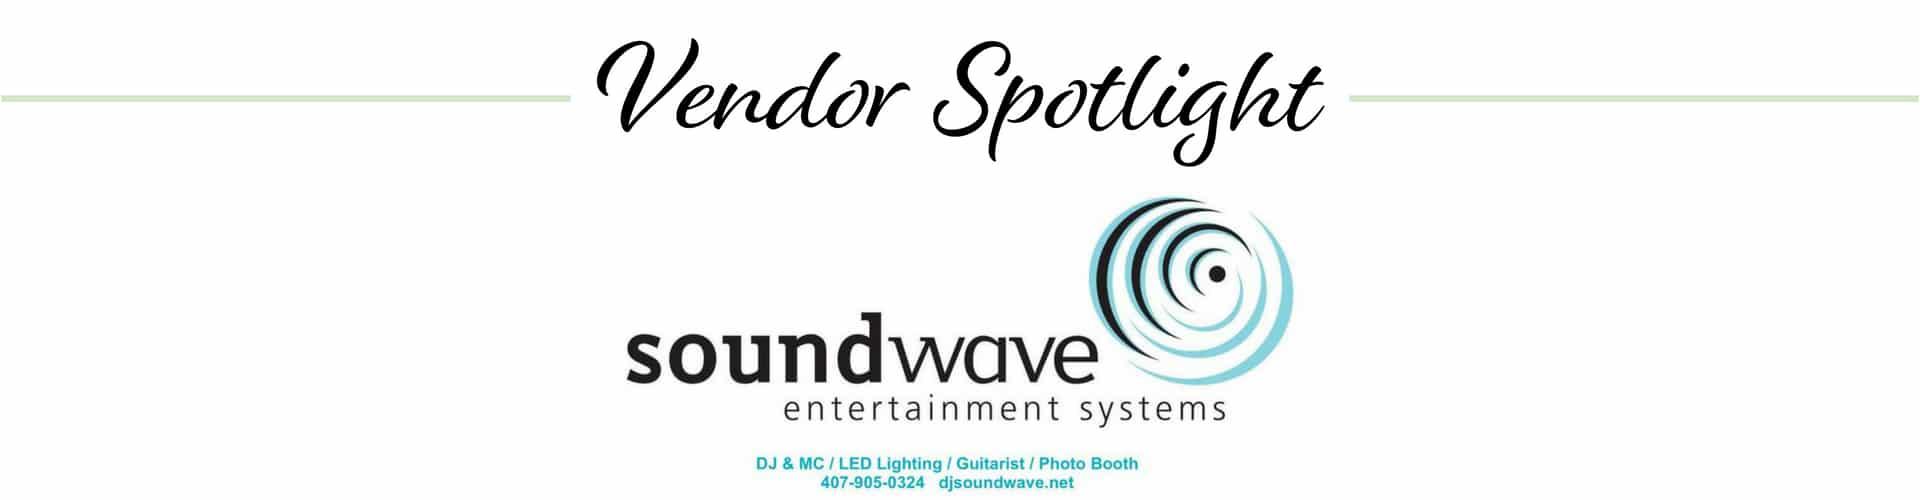 Vendor Spotlight: Soundwave Entertainment